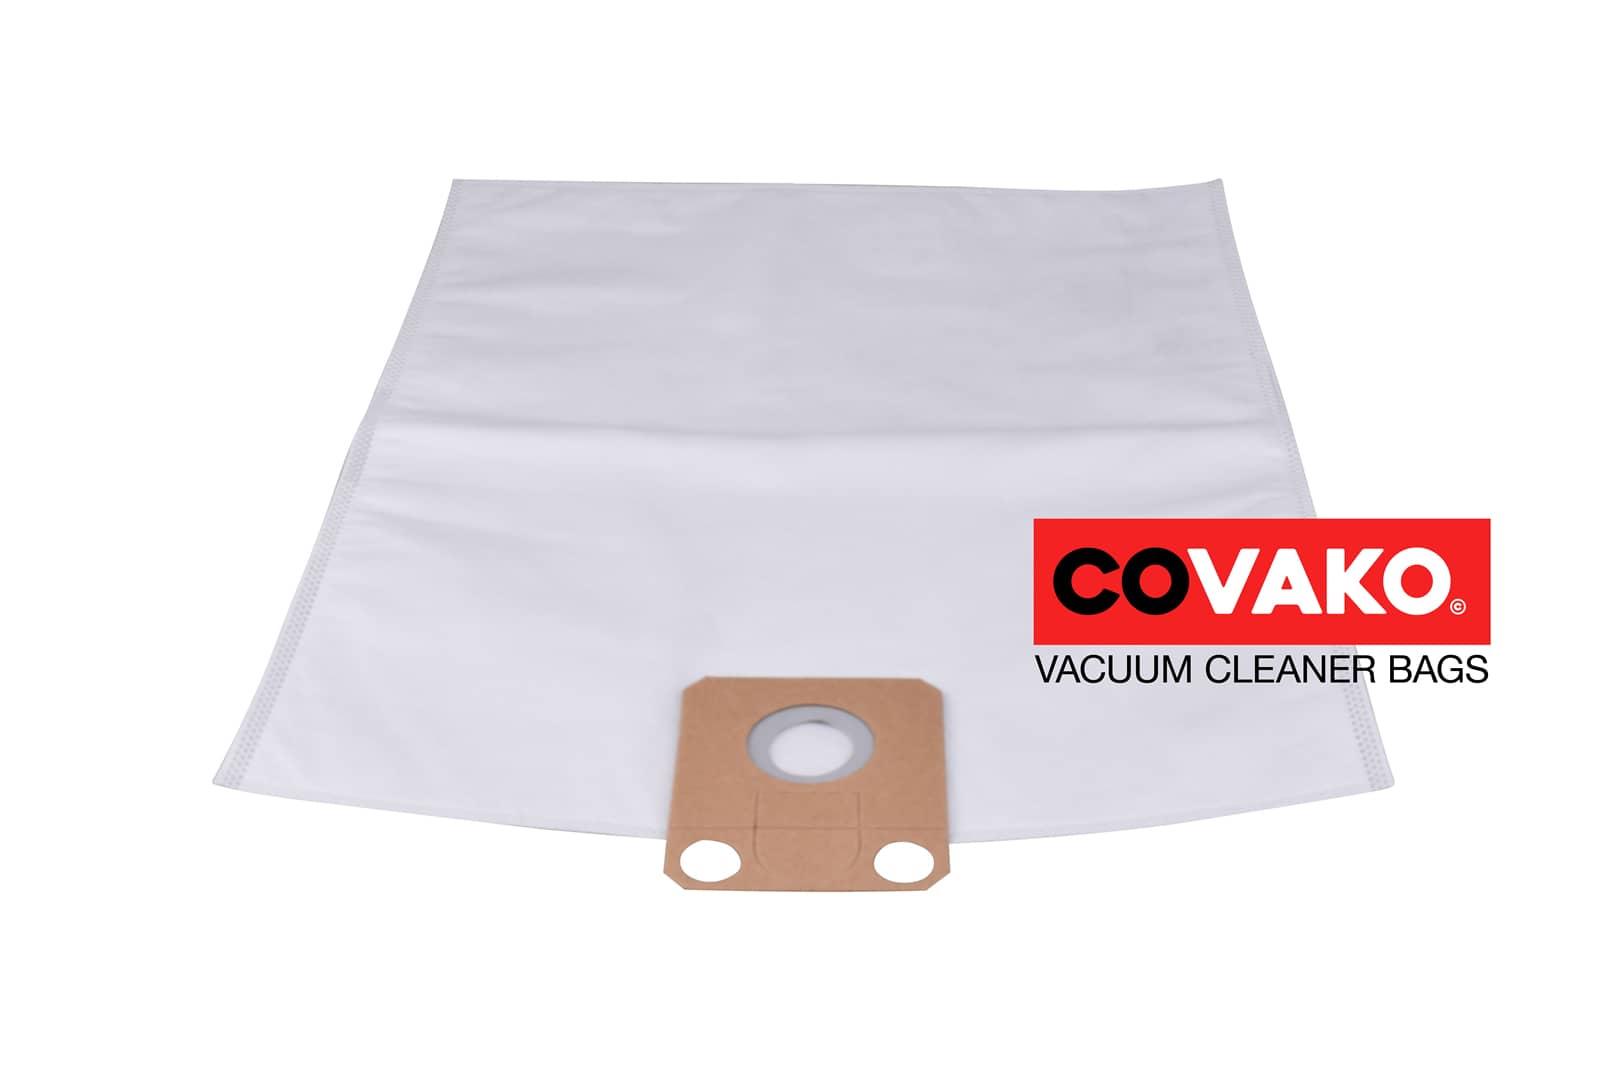 Wap GD 100 / Synthesis - Wap vacuum cleaner bags